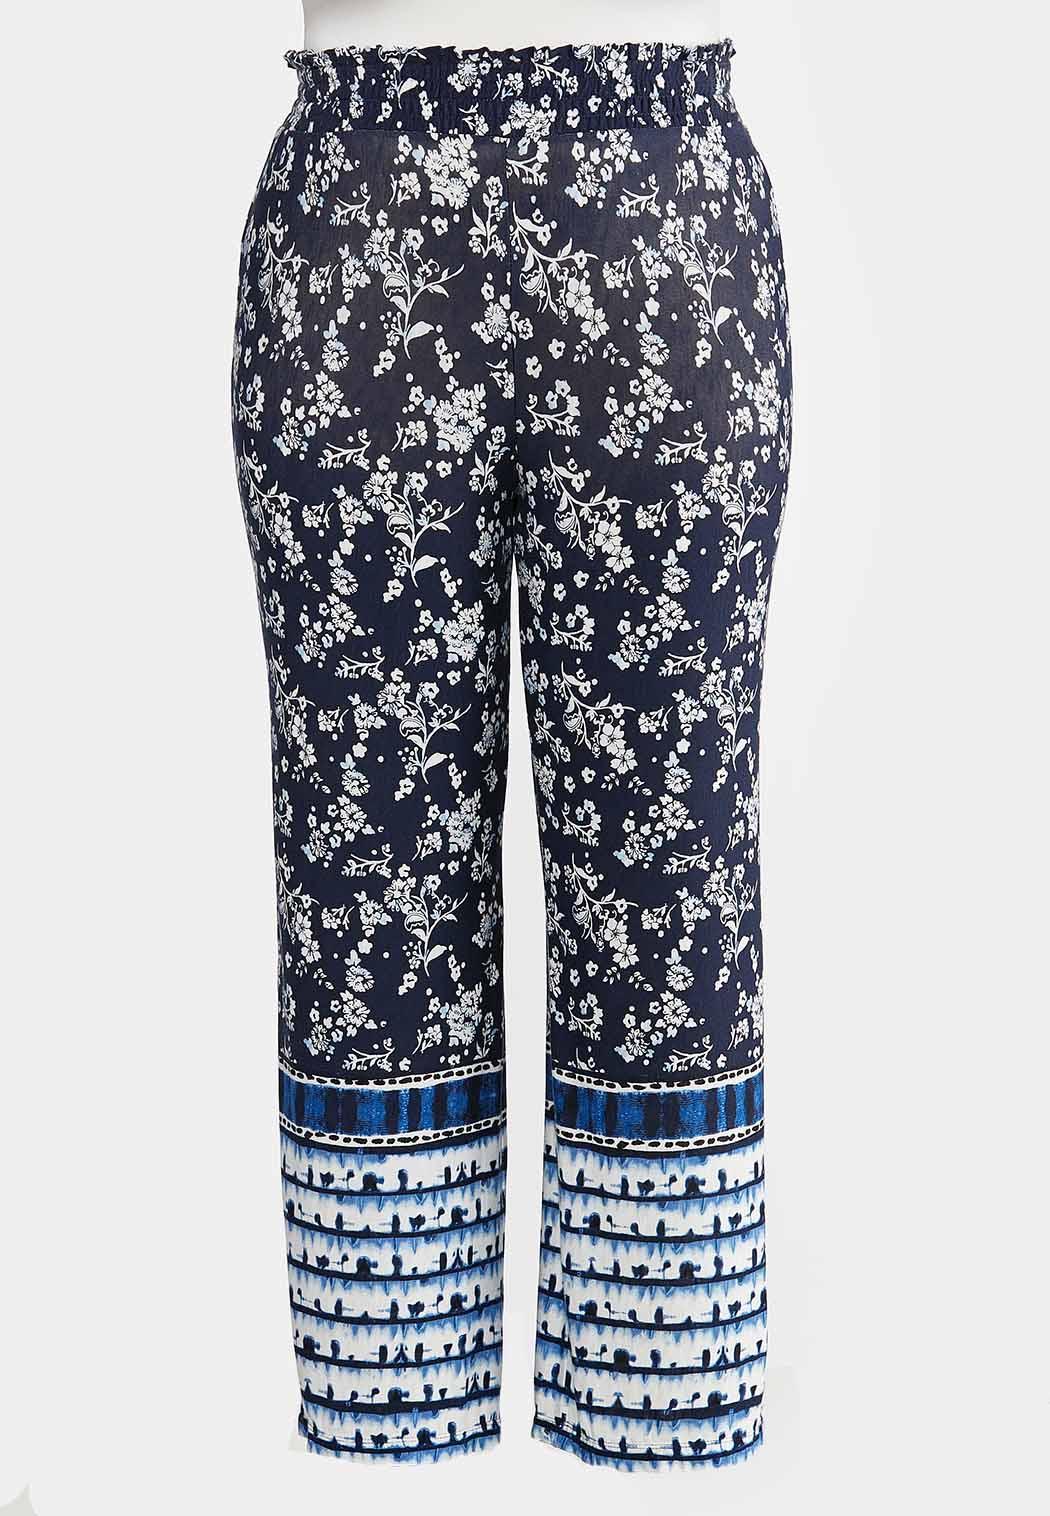 Plus Petite Floral Tie Dye Panel Pants